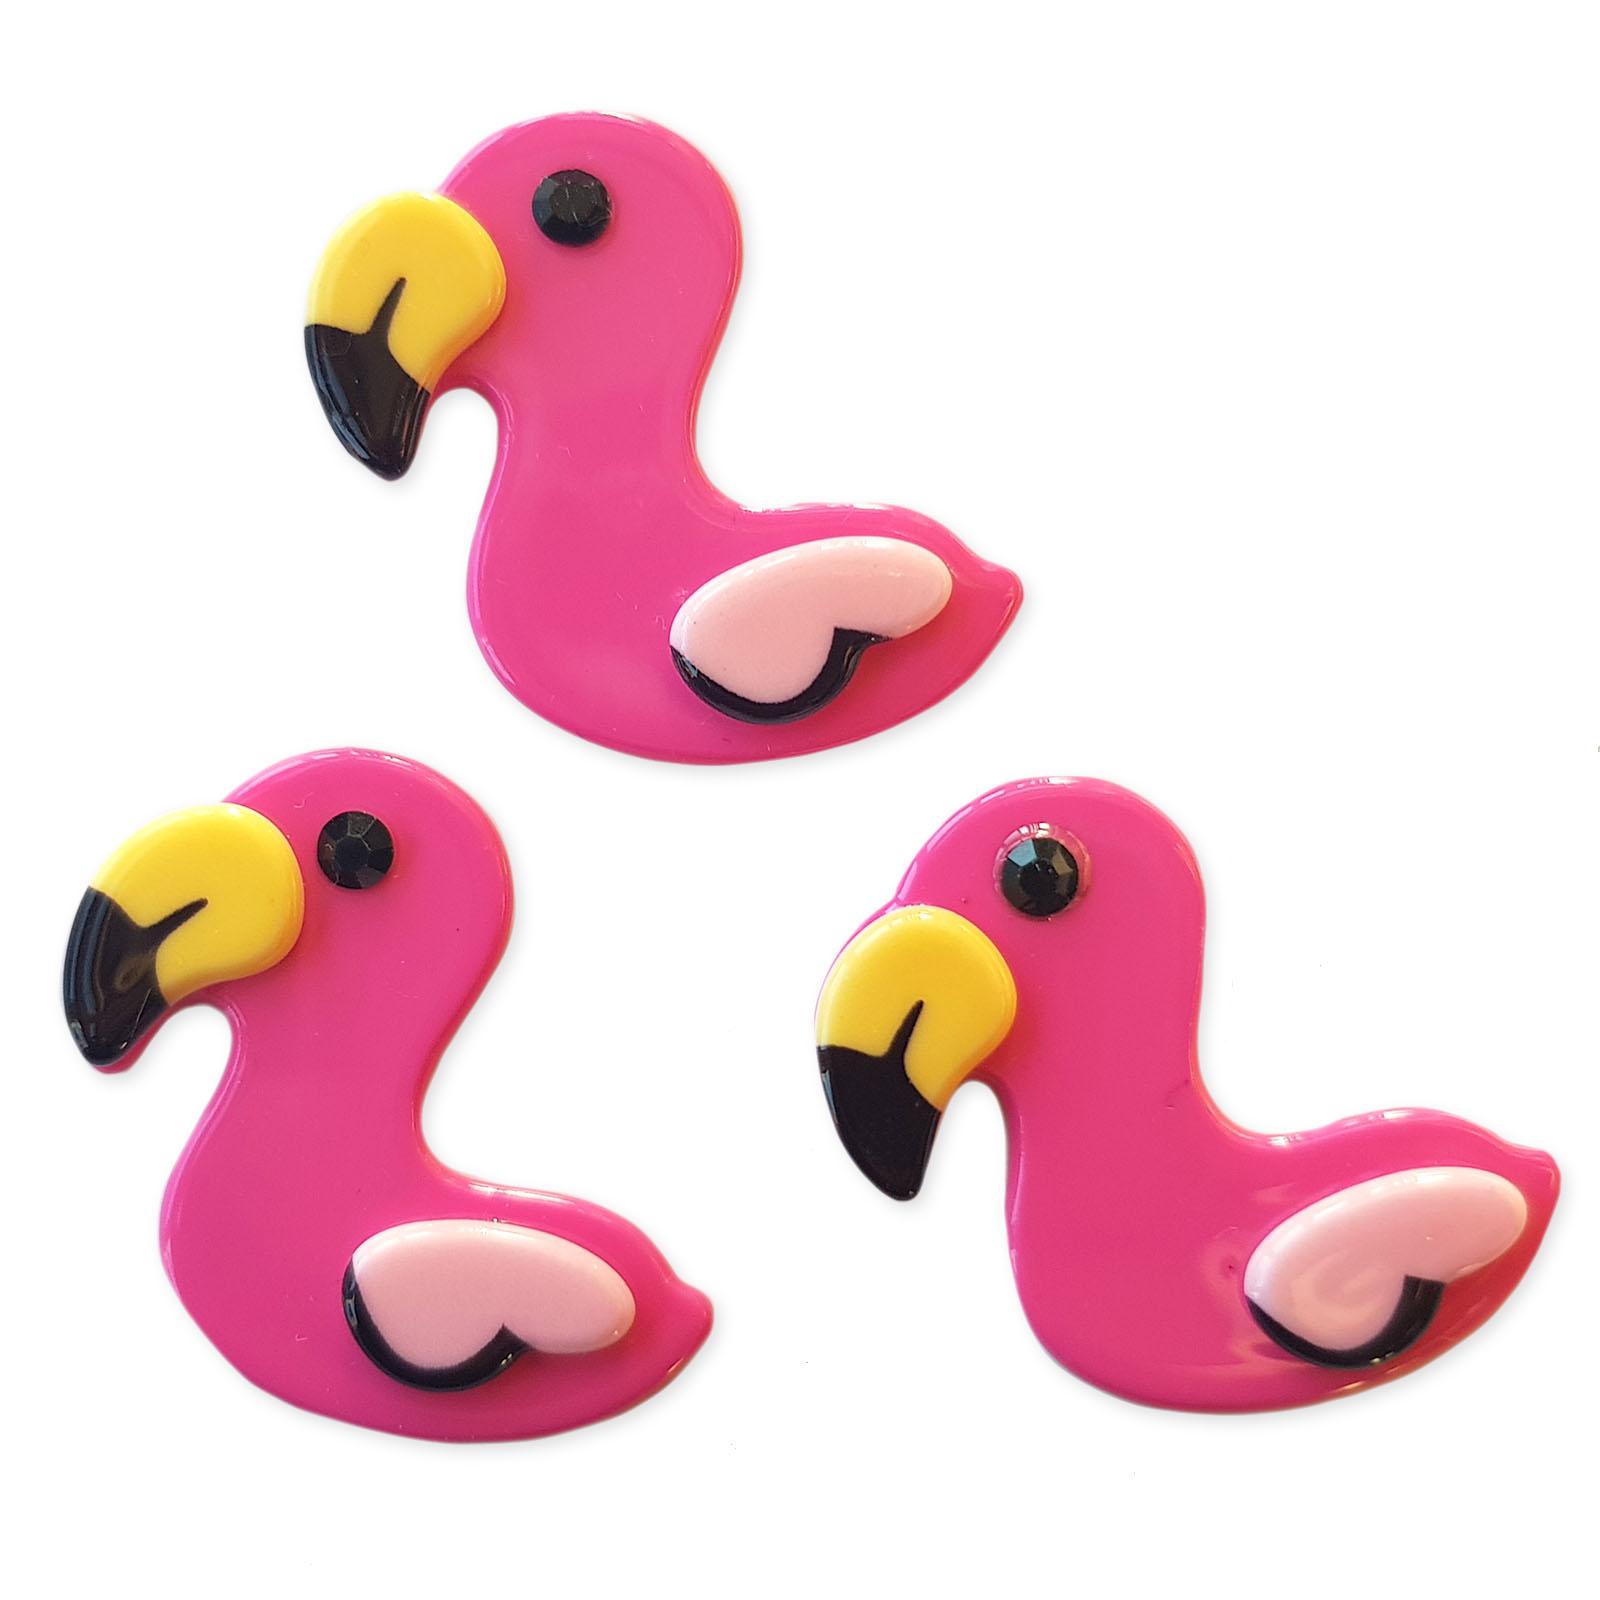 5pcs Pink Resin Flamingo Flatback Cabochons Embellishment Decoden Craft